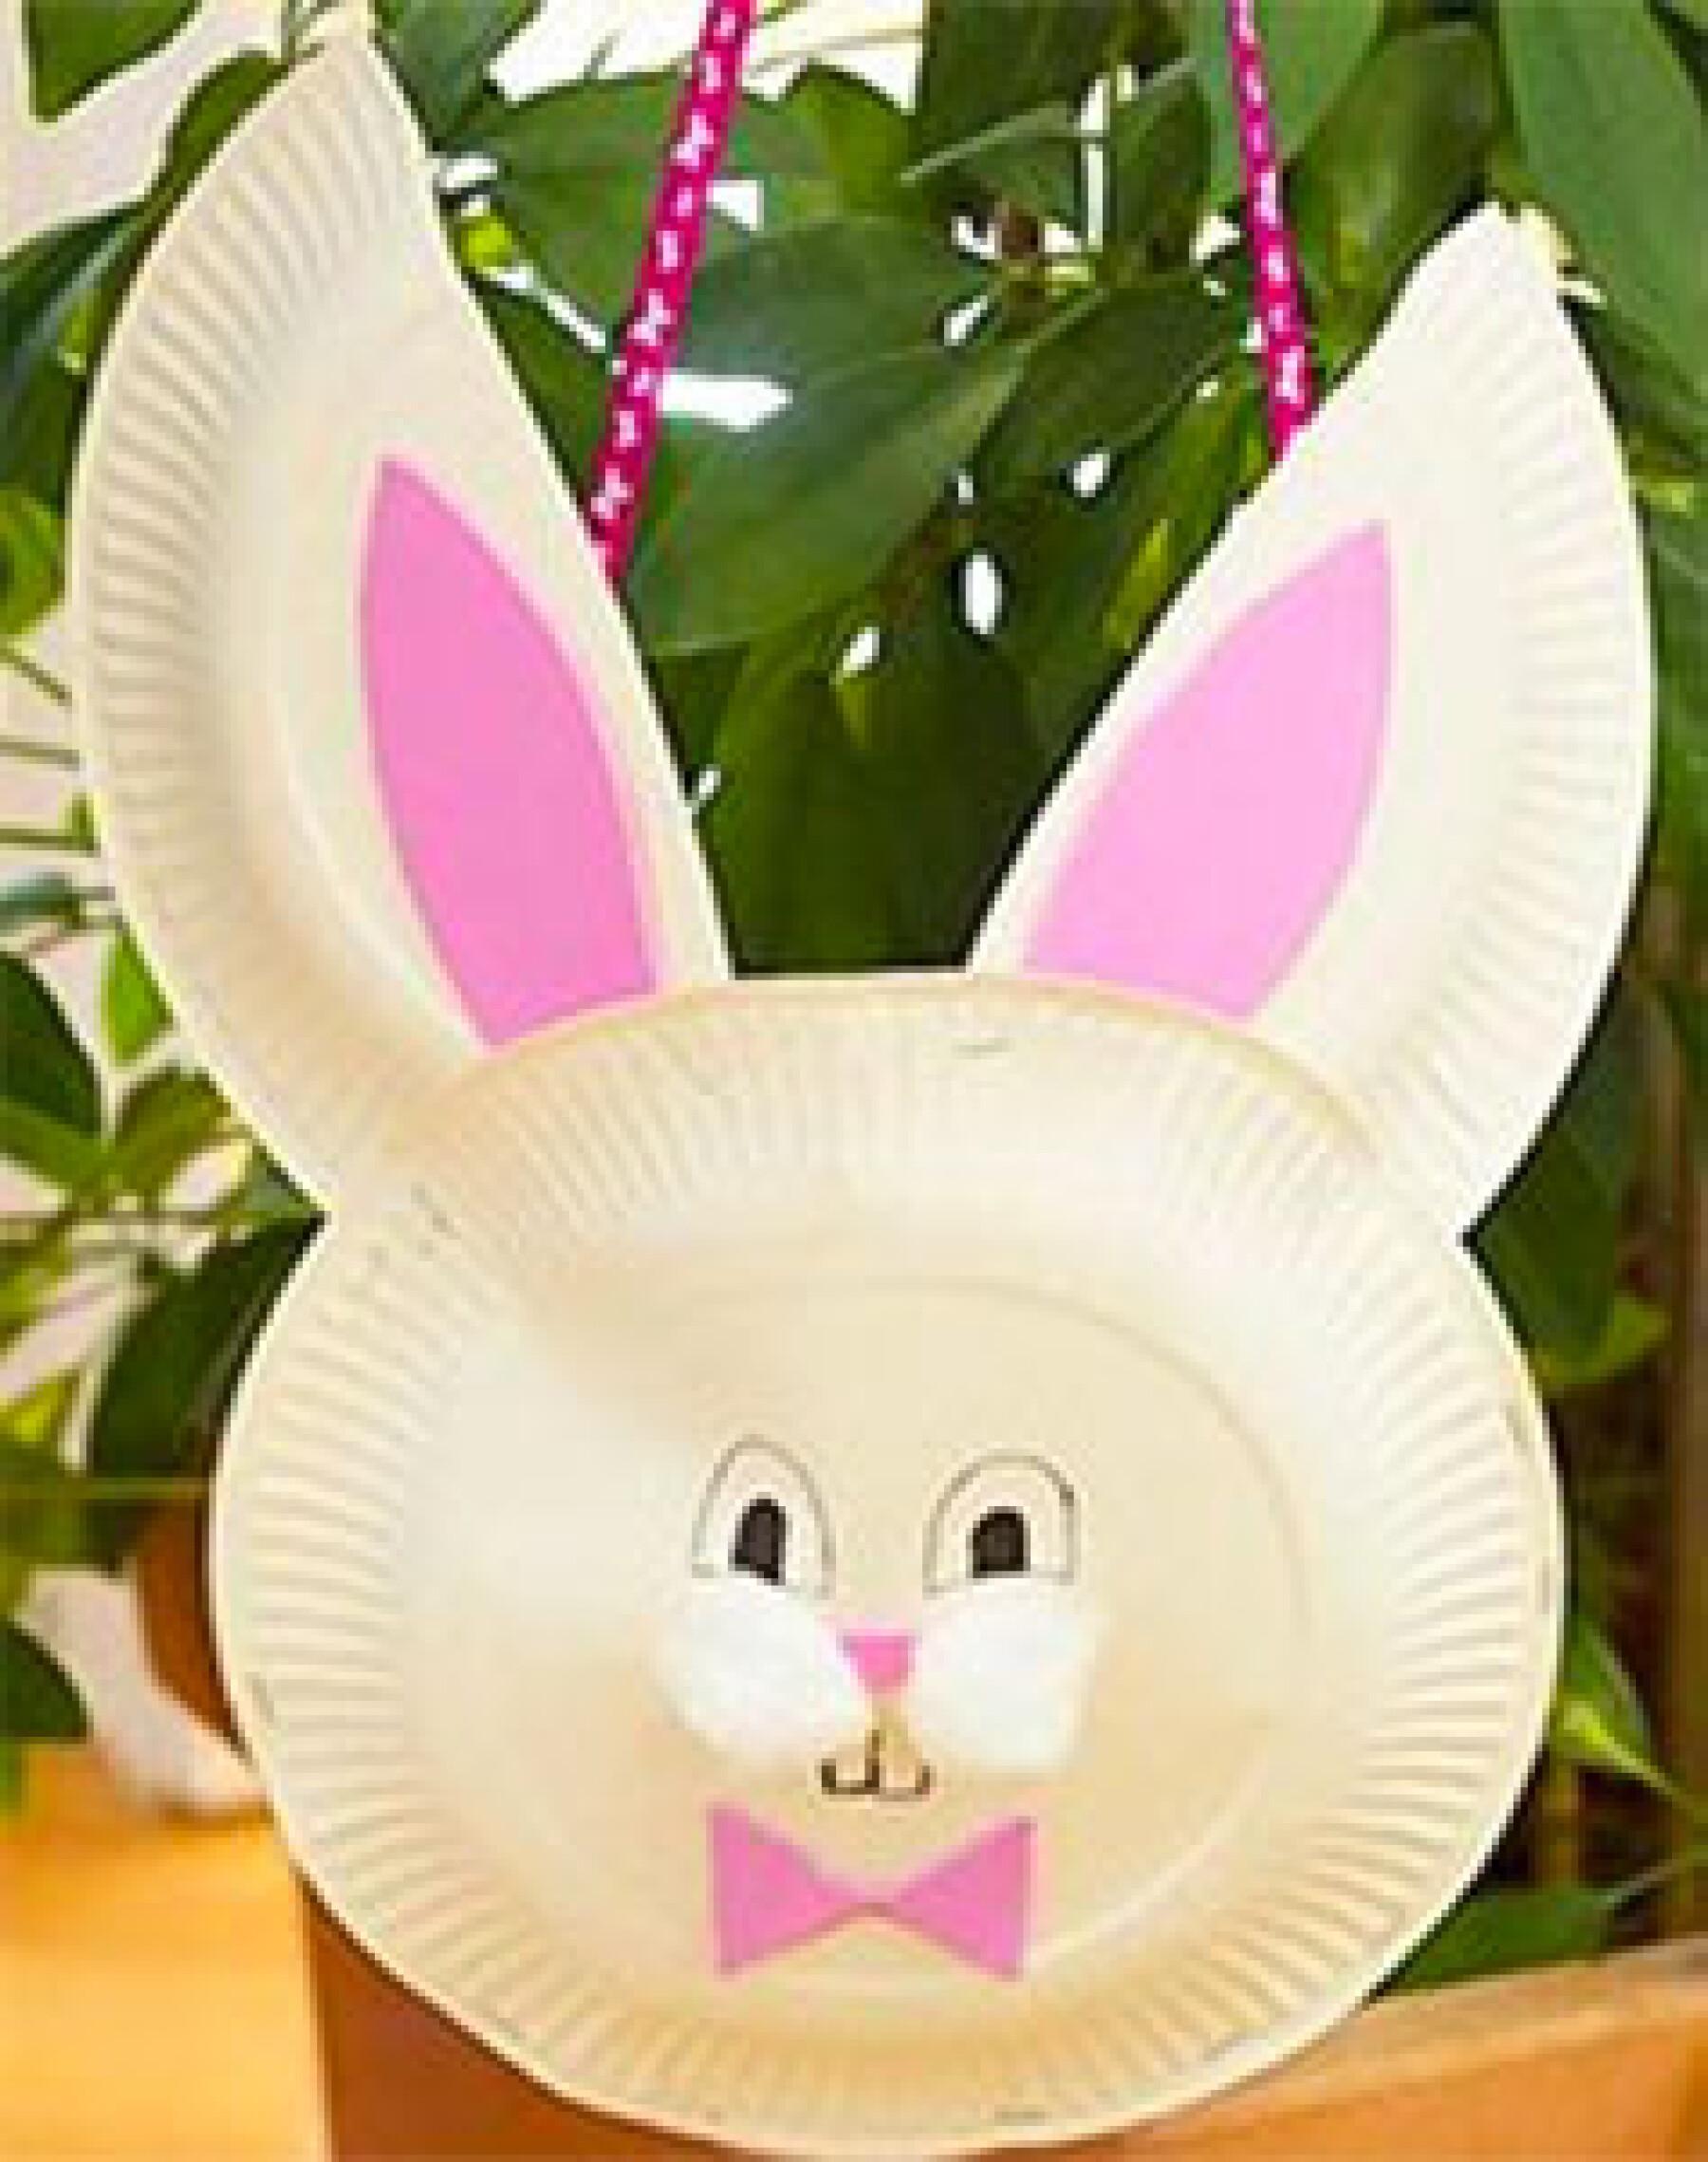 bricolage panier de Pâques lapin